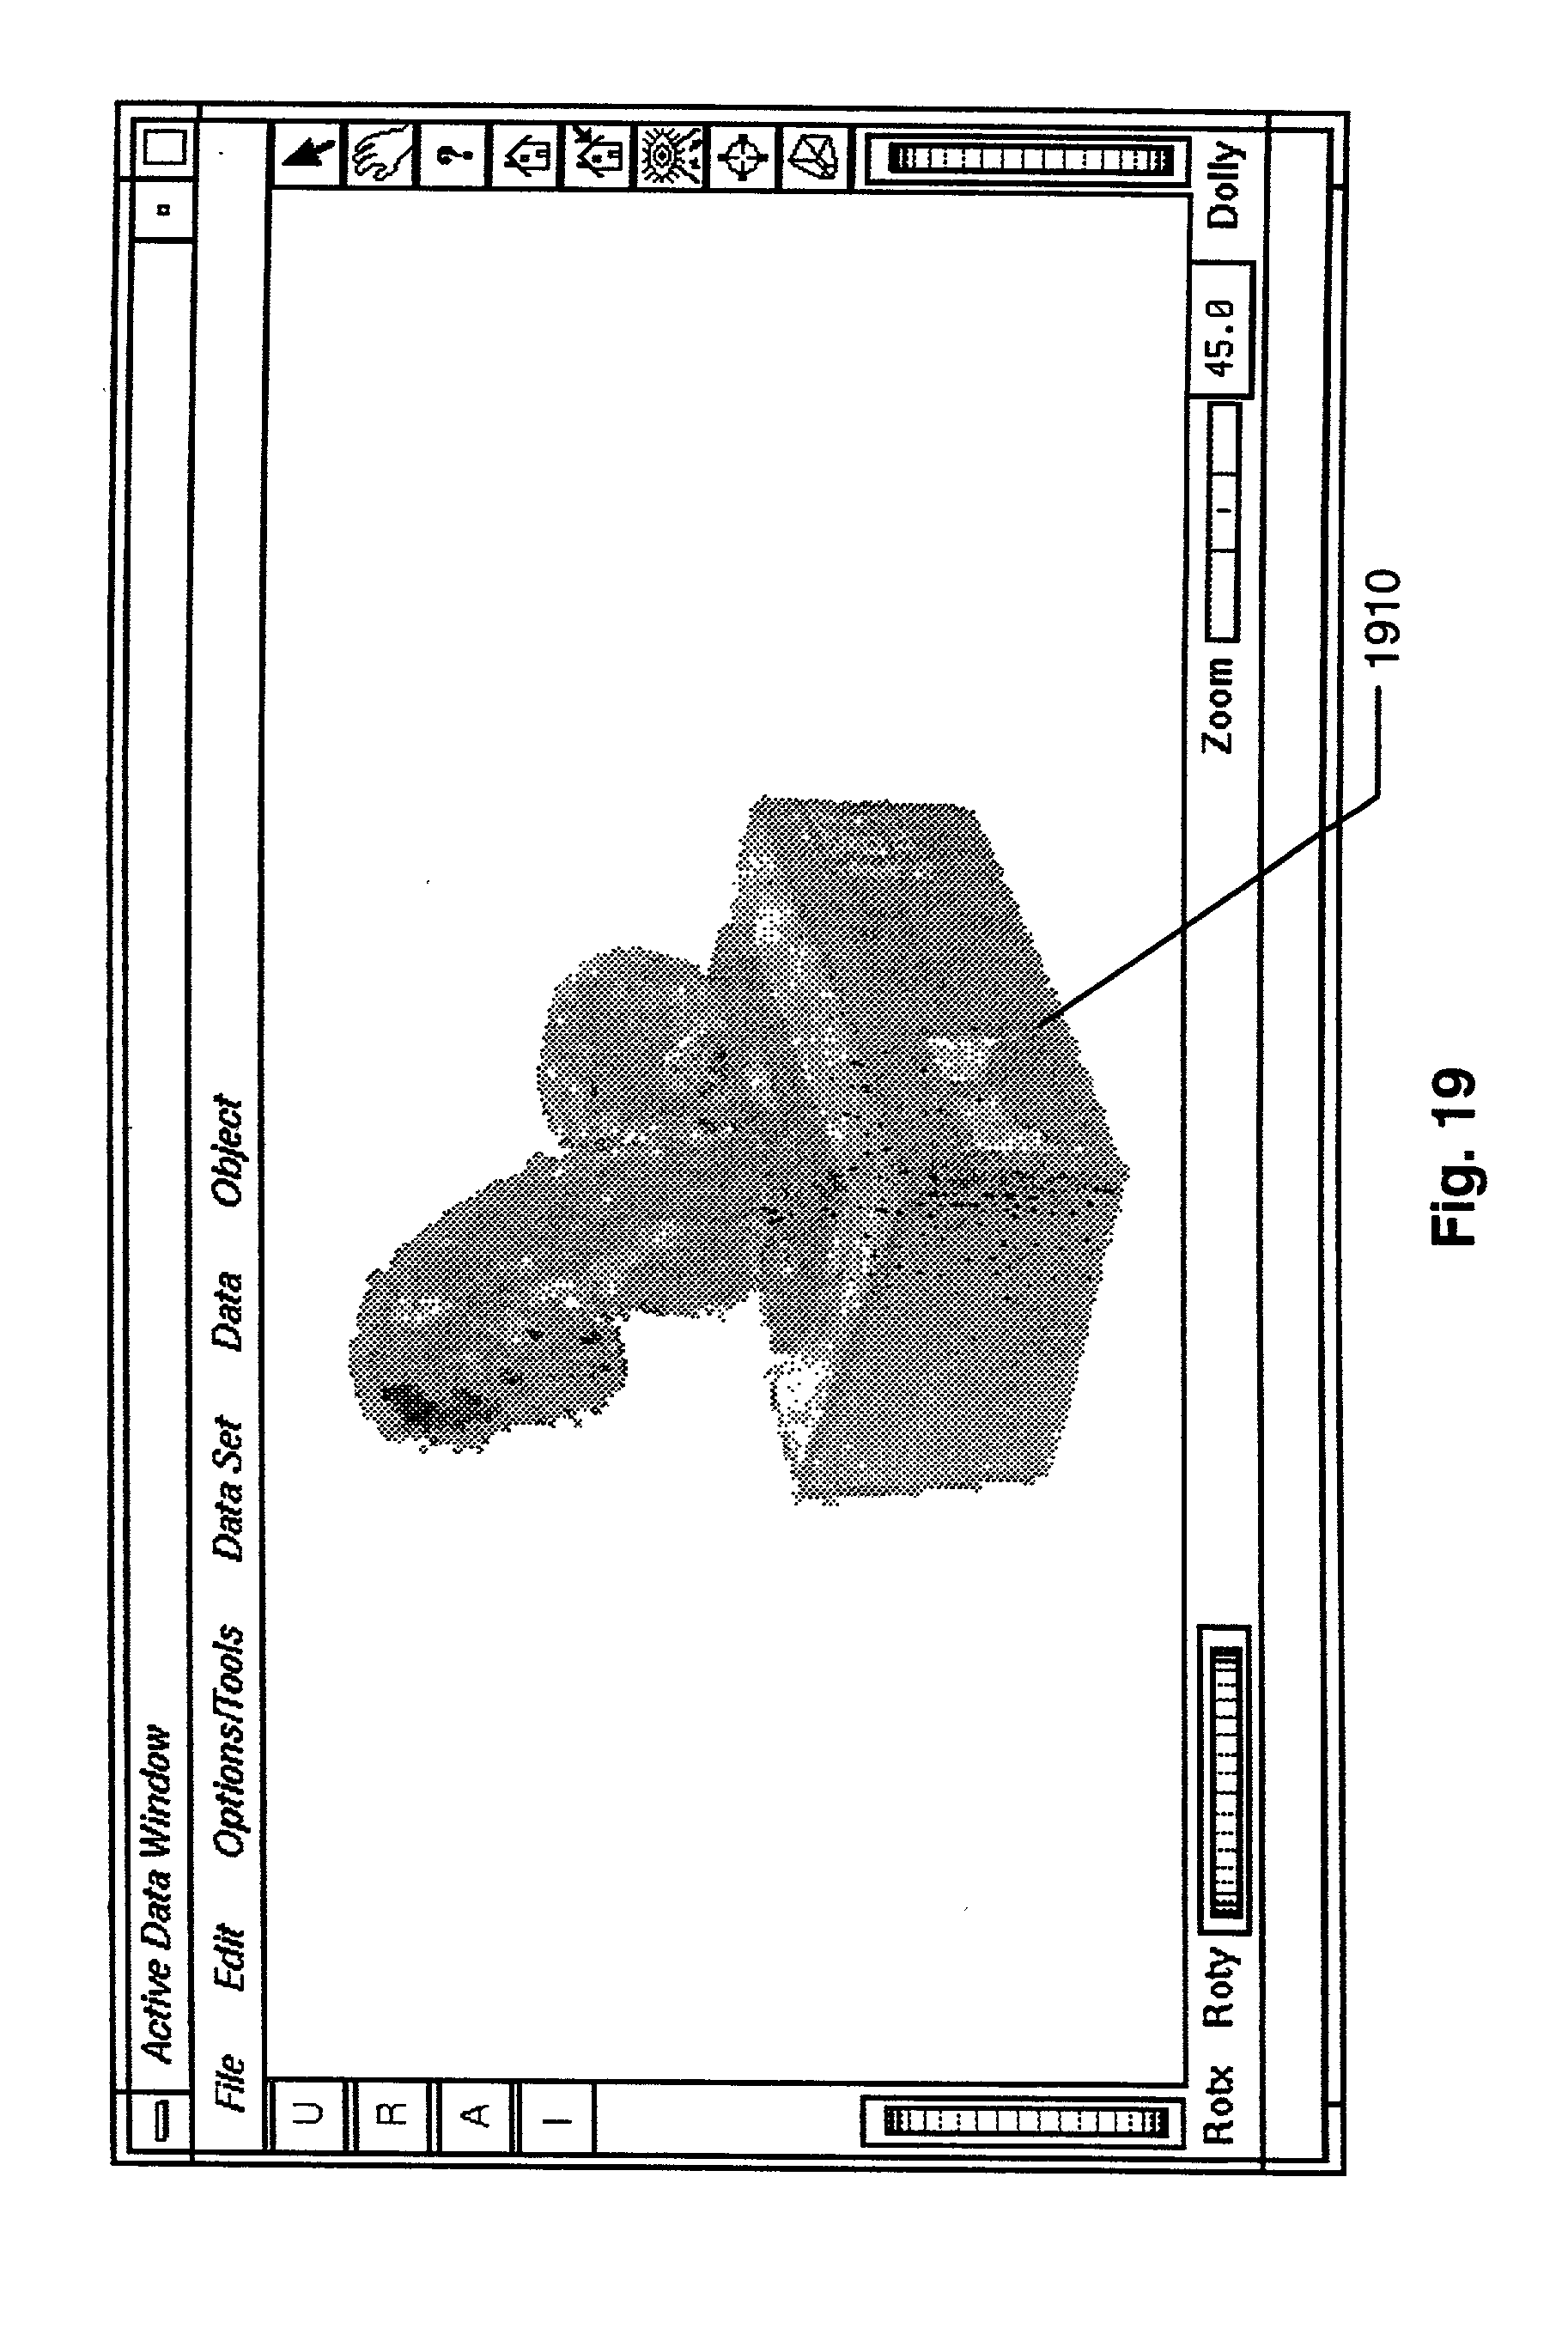 Patent Us 20020145607a1 Fig19 Simple Zener Diode Voltage Regulator Circuit Images